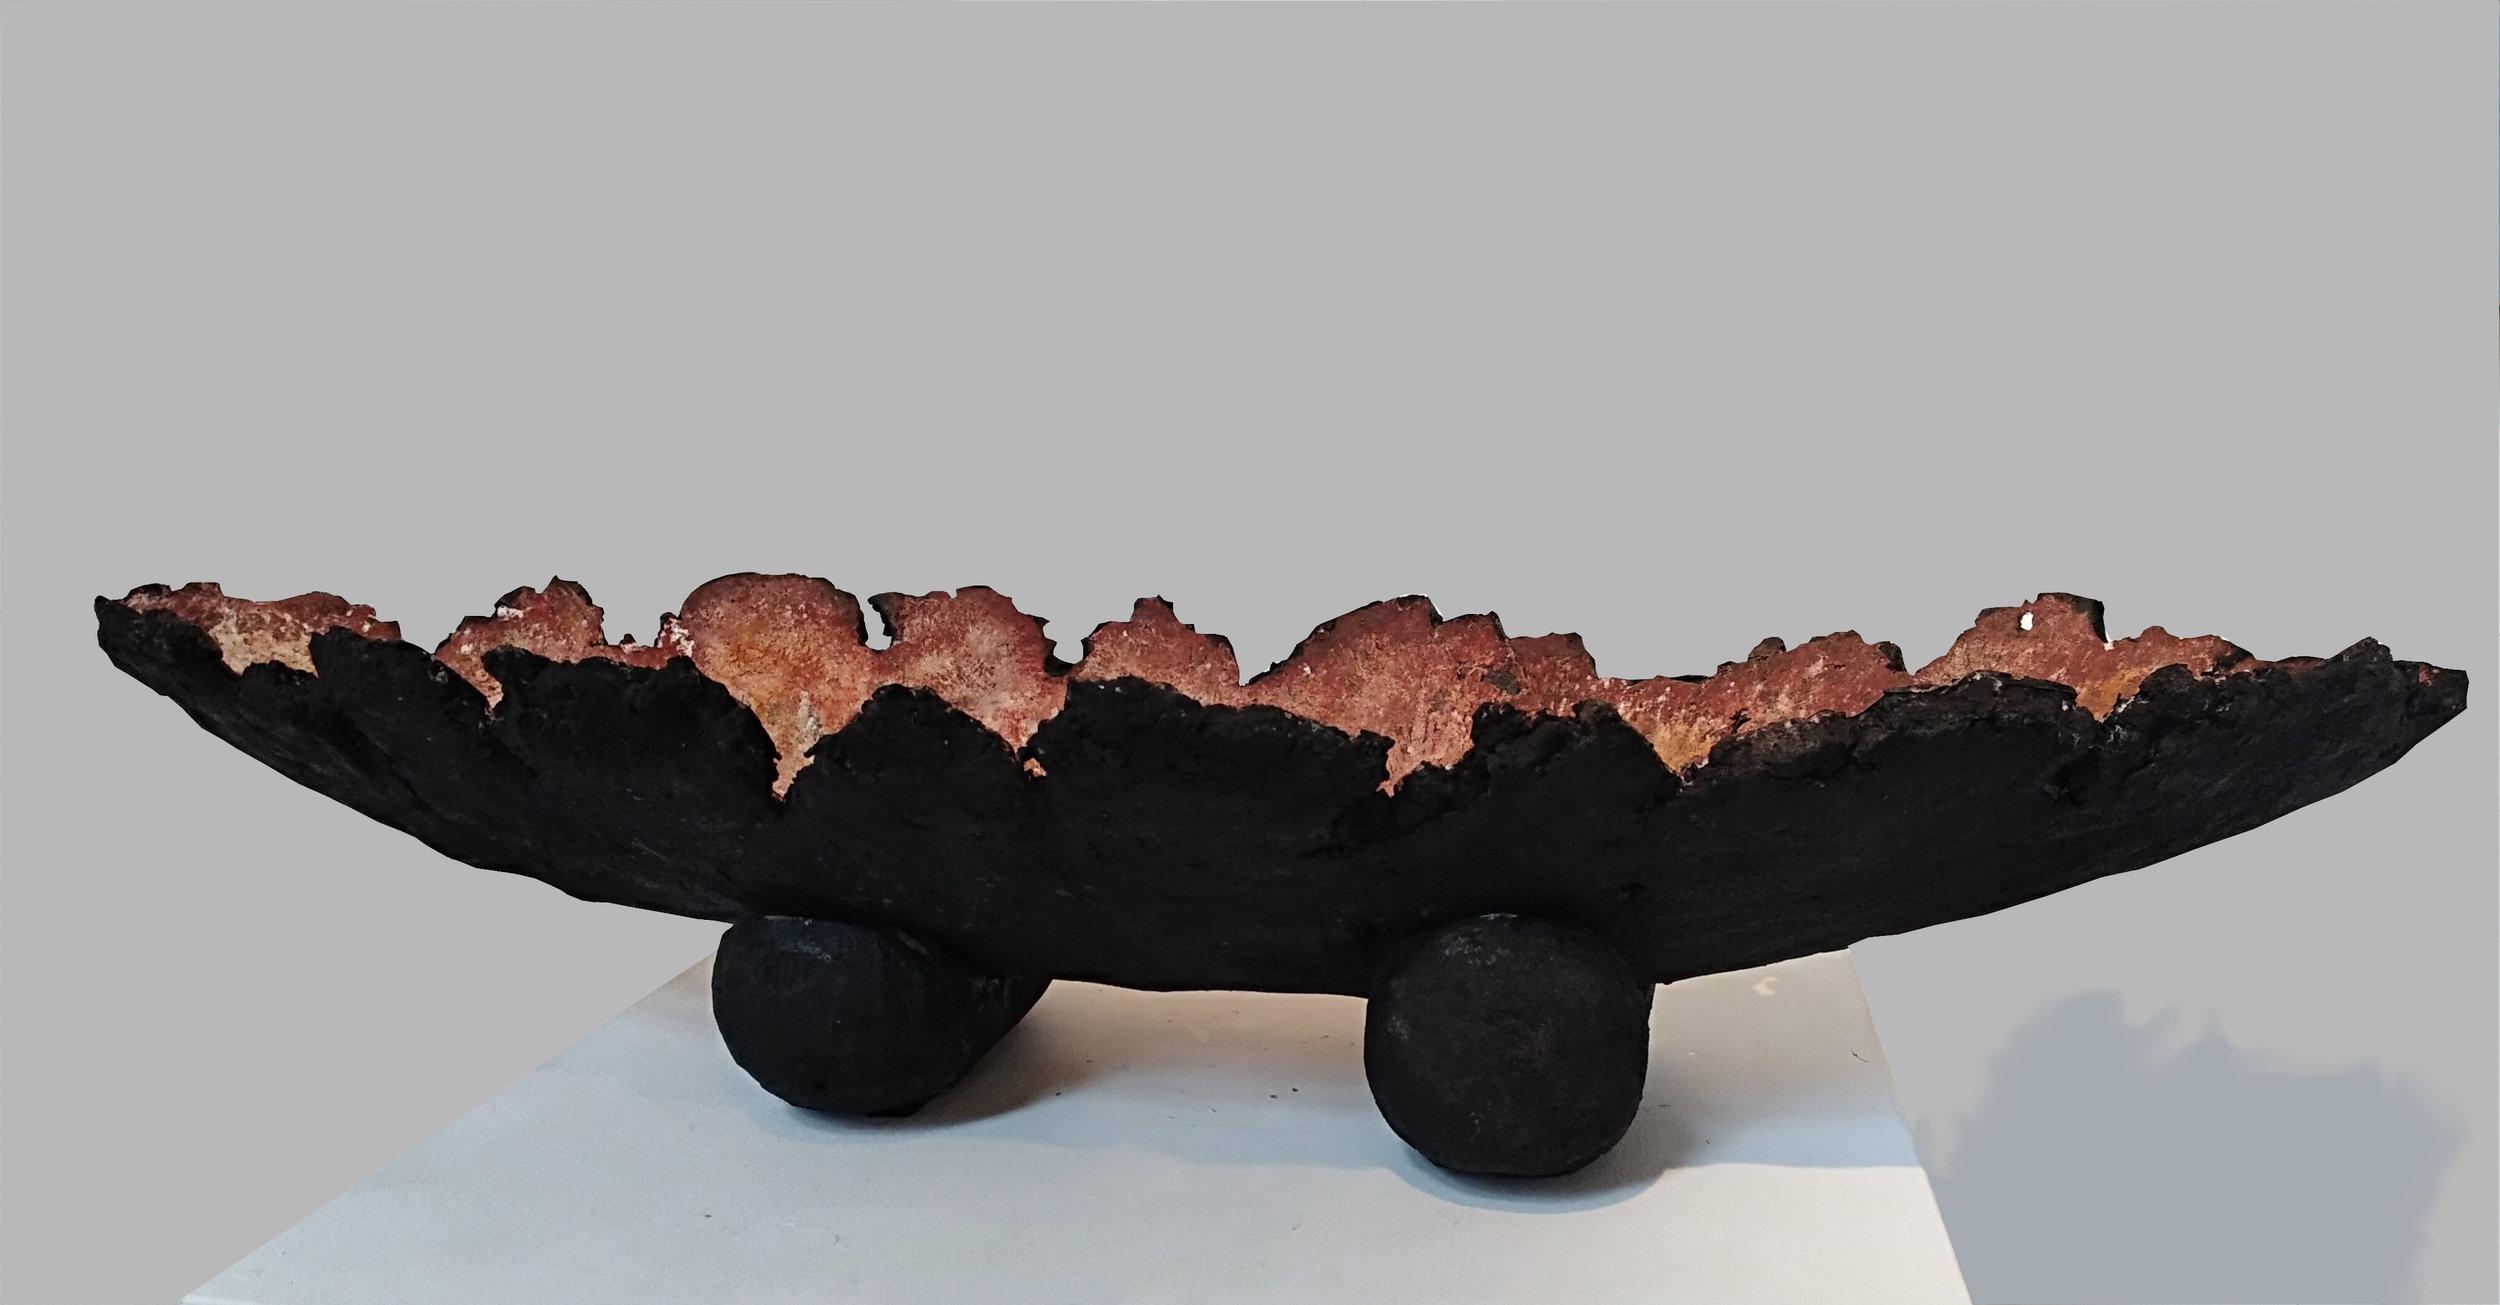 Black Jagged Vessel  John Phillips, artis fiberclay  $550.00